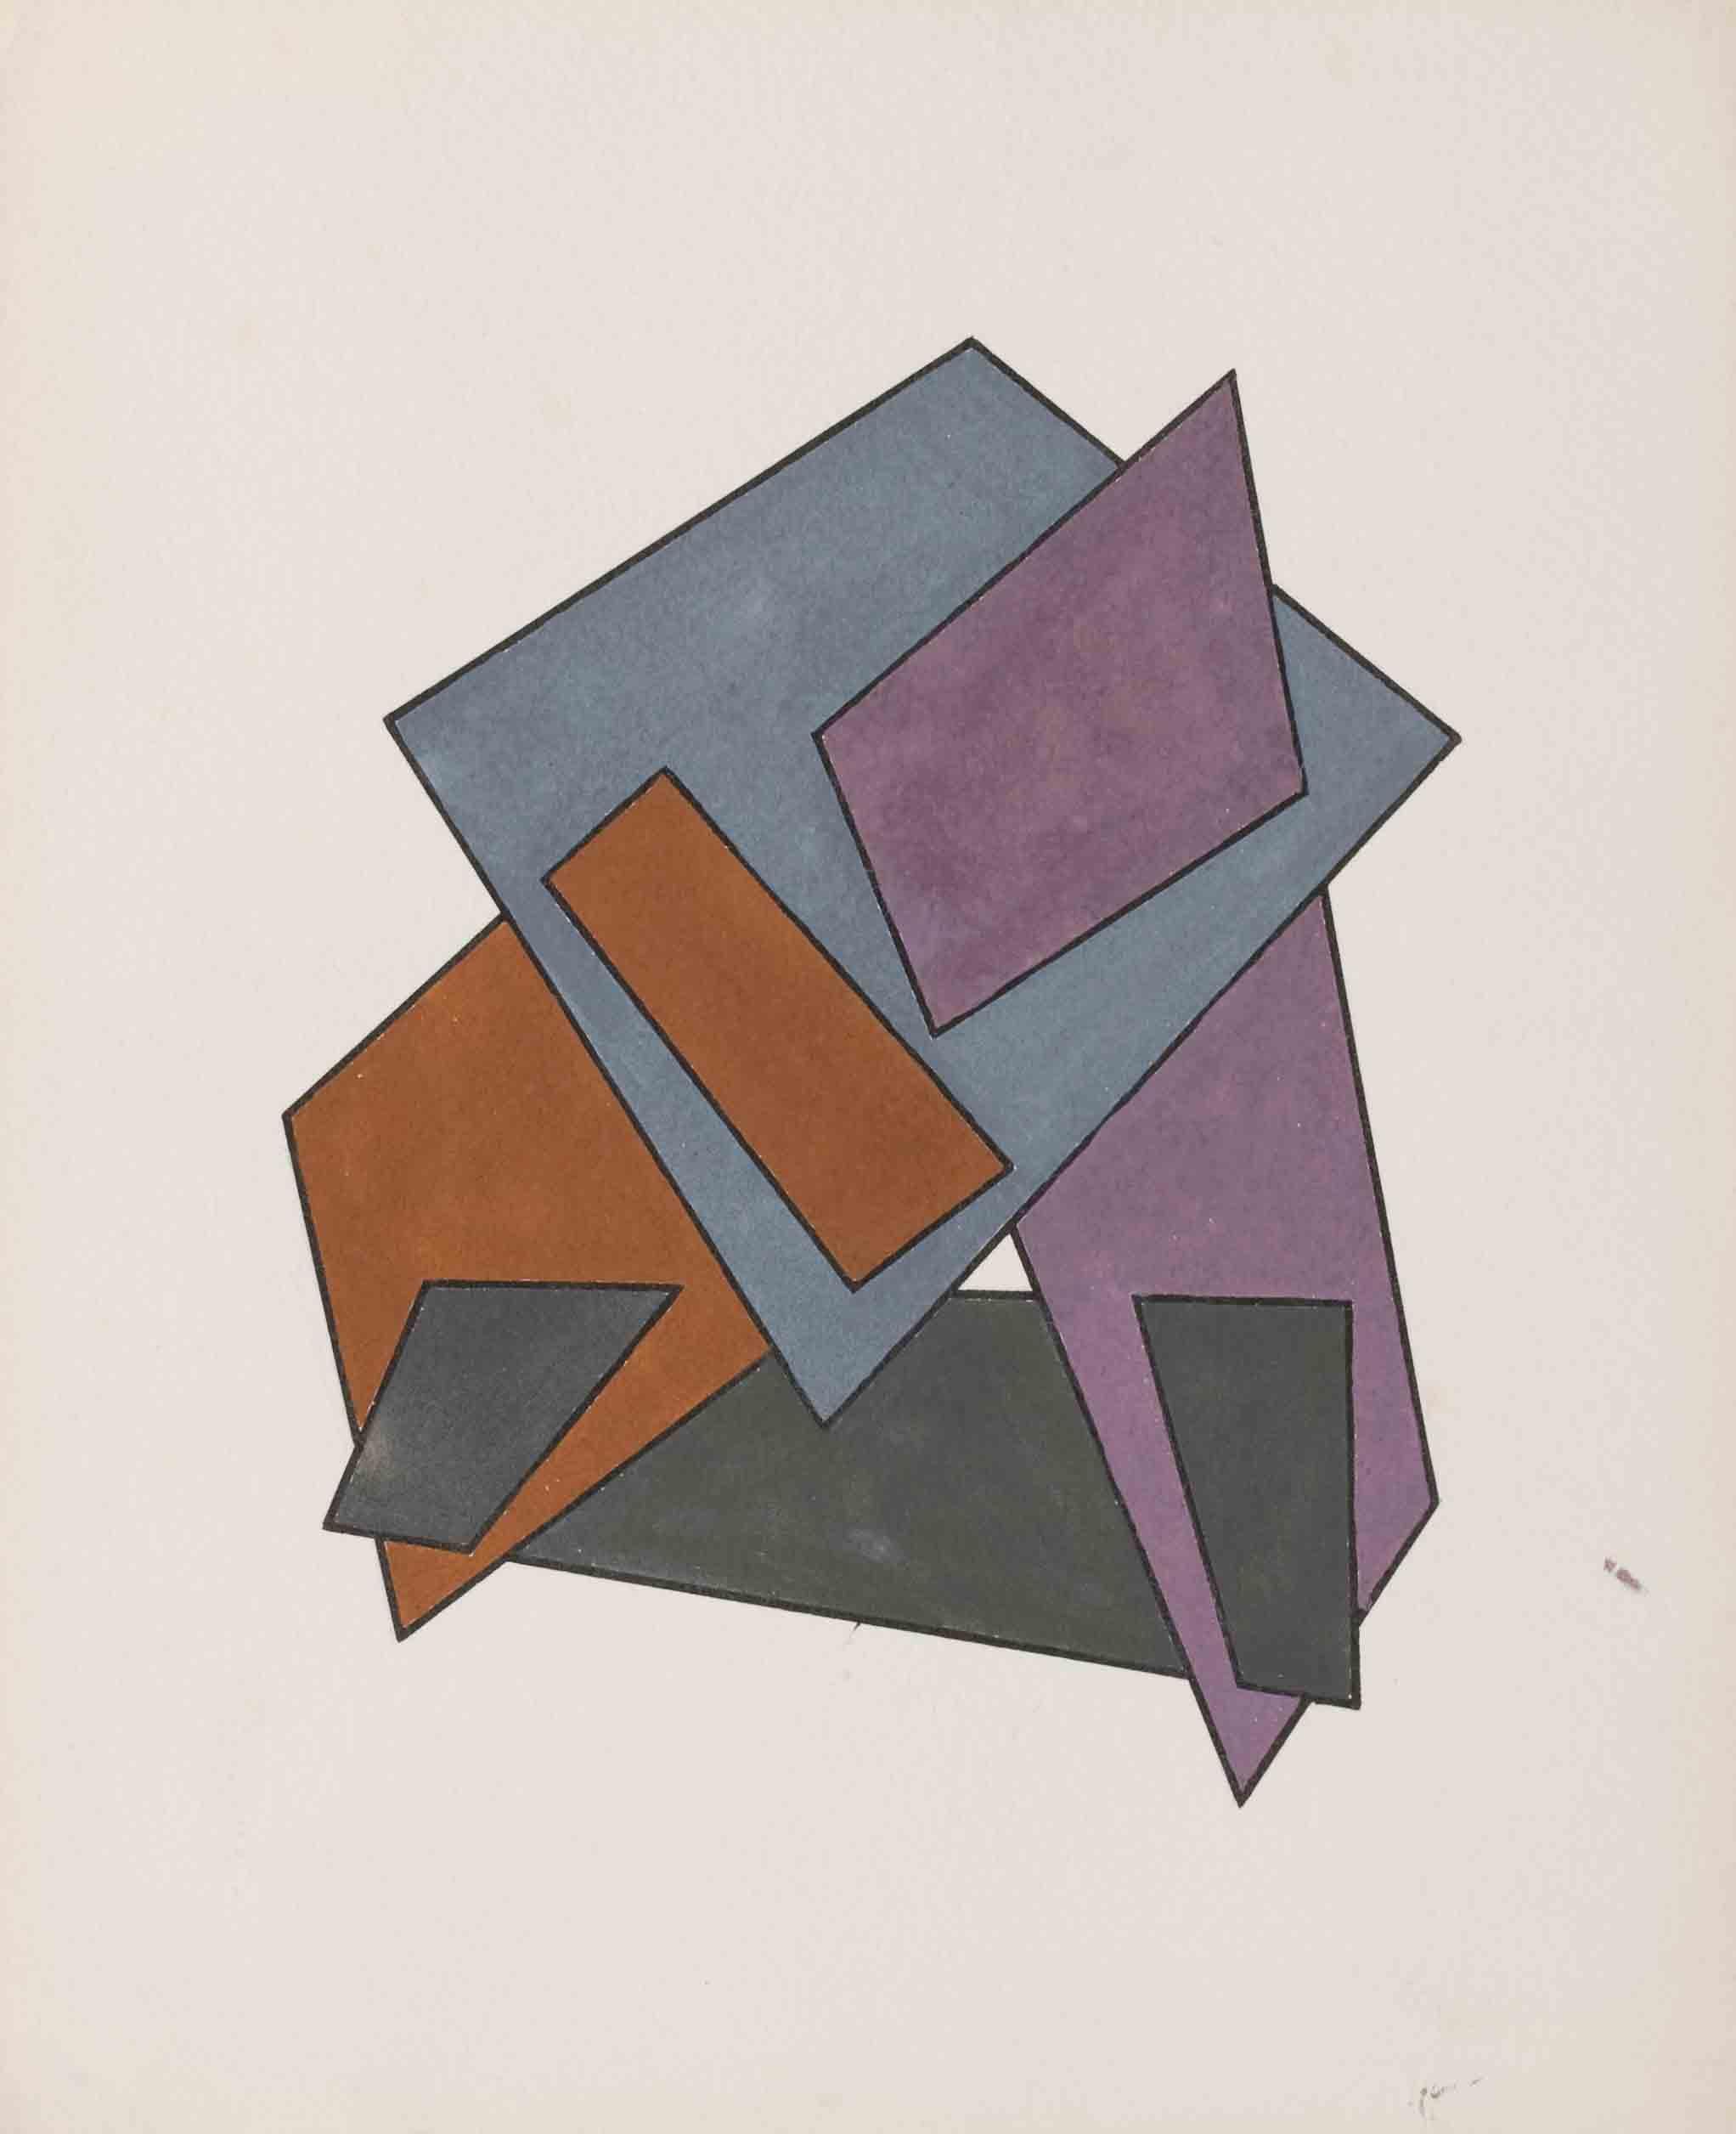 Complicated Figures (no. 35), mid 1920s - Yakov Chernikhov